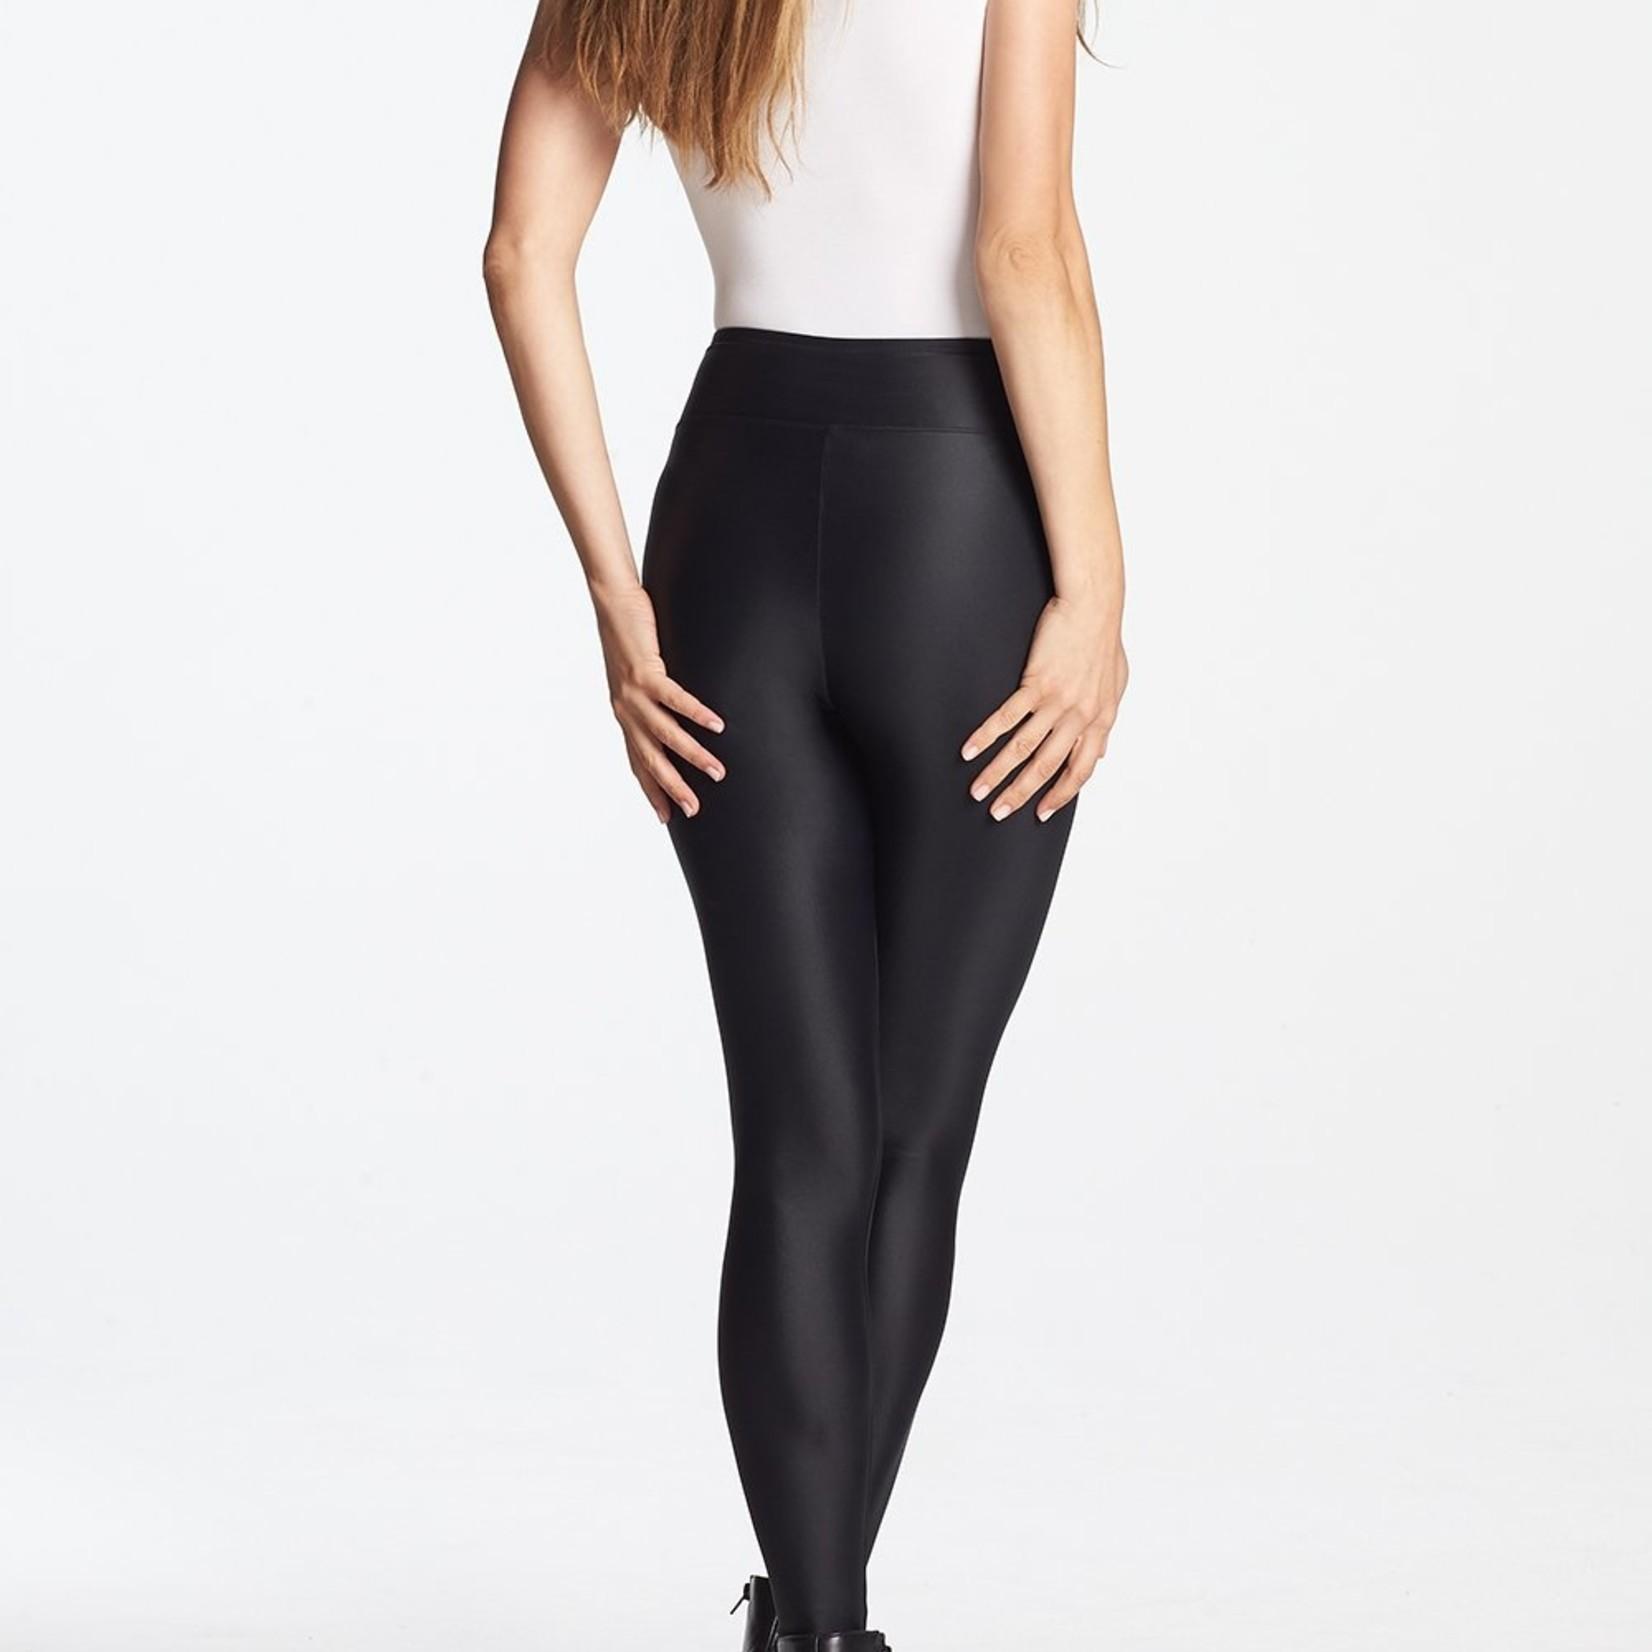 yanna shiny shapewear leggings